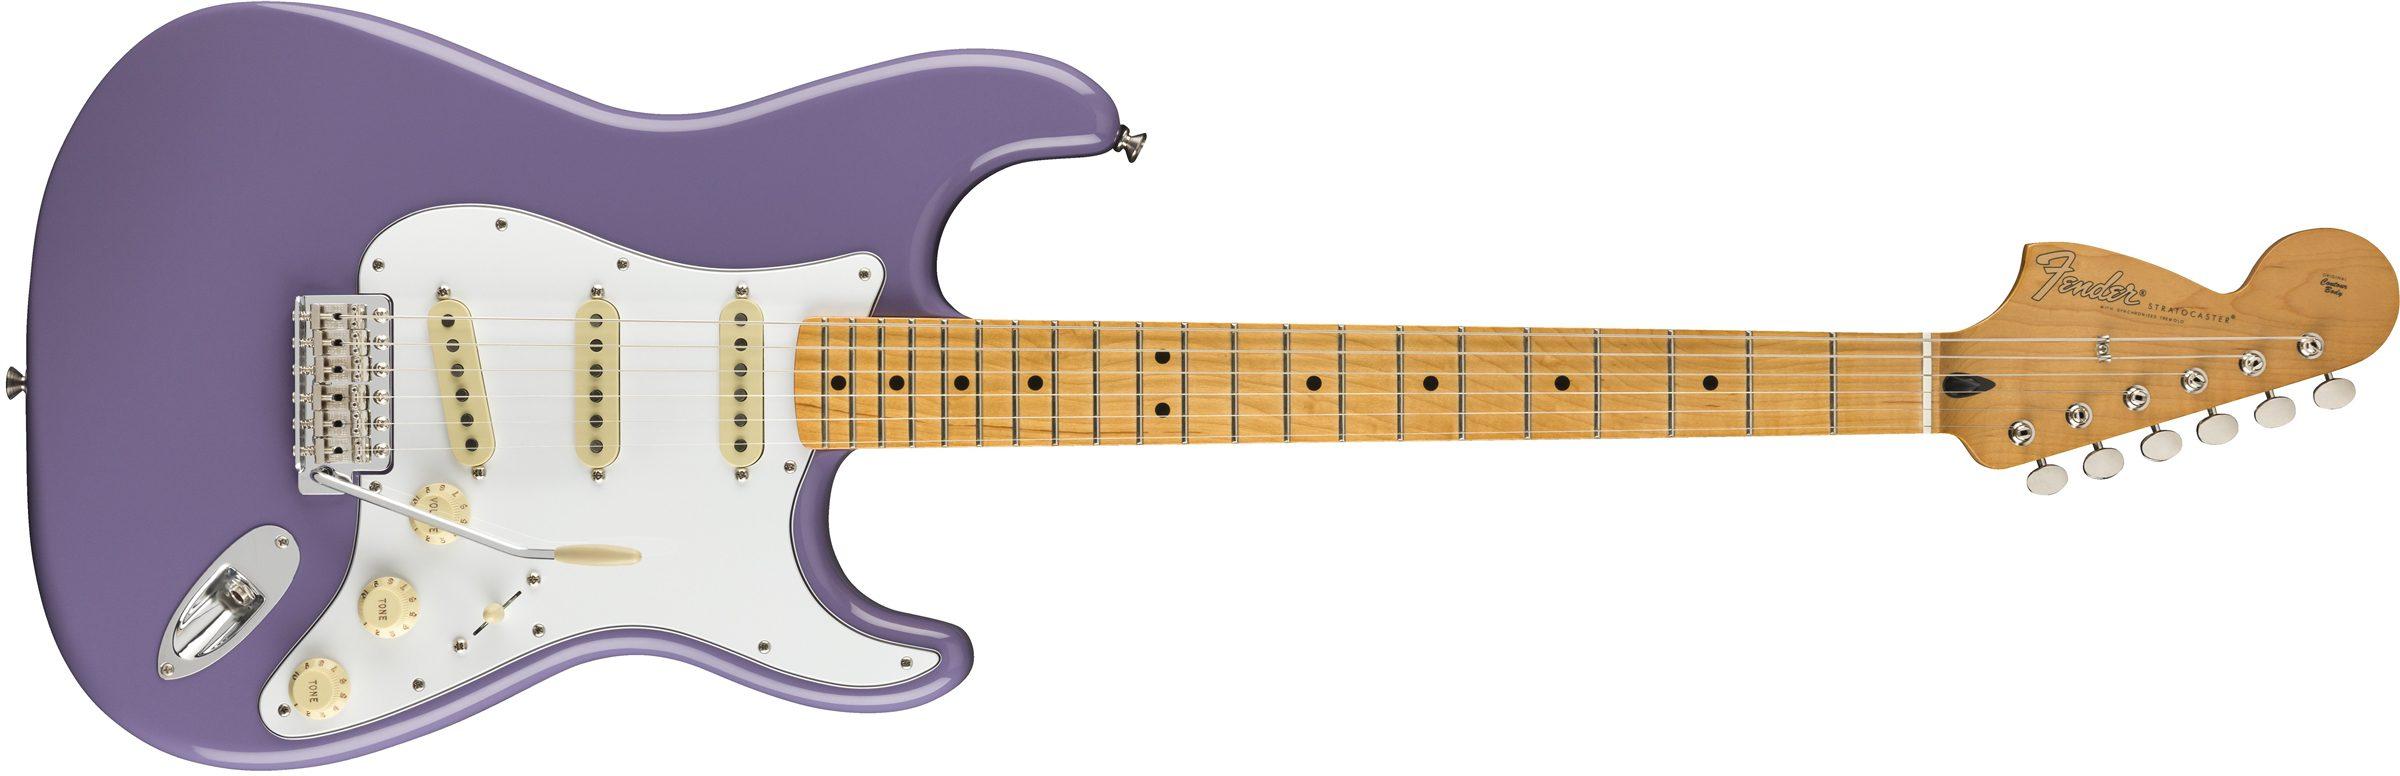 Fender-2018-Ultra-Violet-Hendrix-Stratocaster